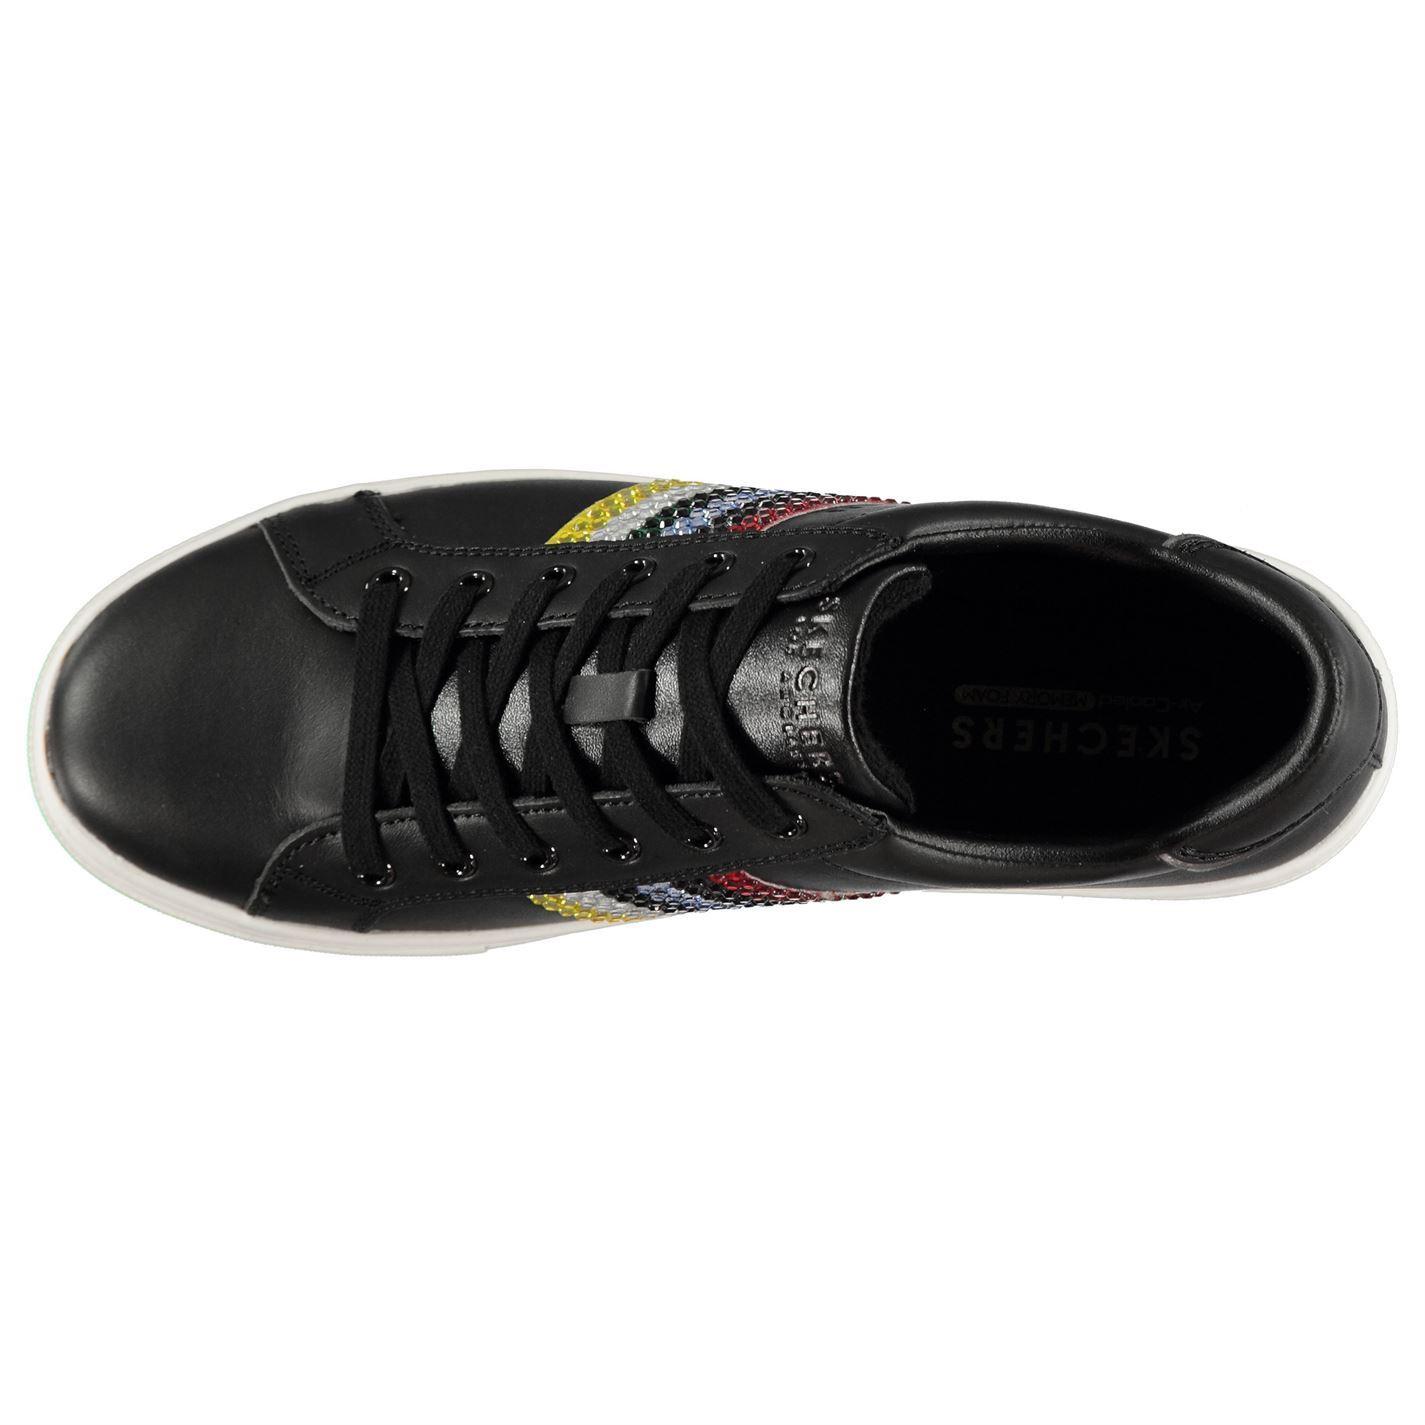 NEU SKECHERS Damen Sneakers Turnschuh Sportschuh Memory Foam OG92 GOLDIE Blau | eBay